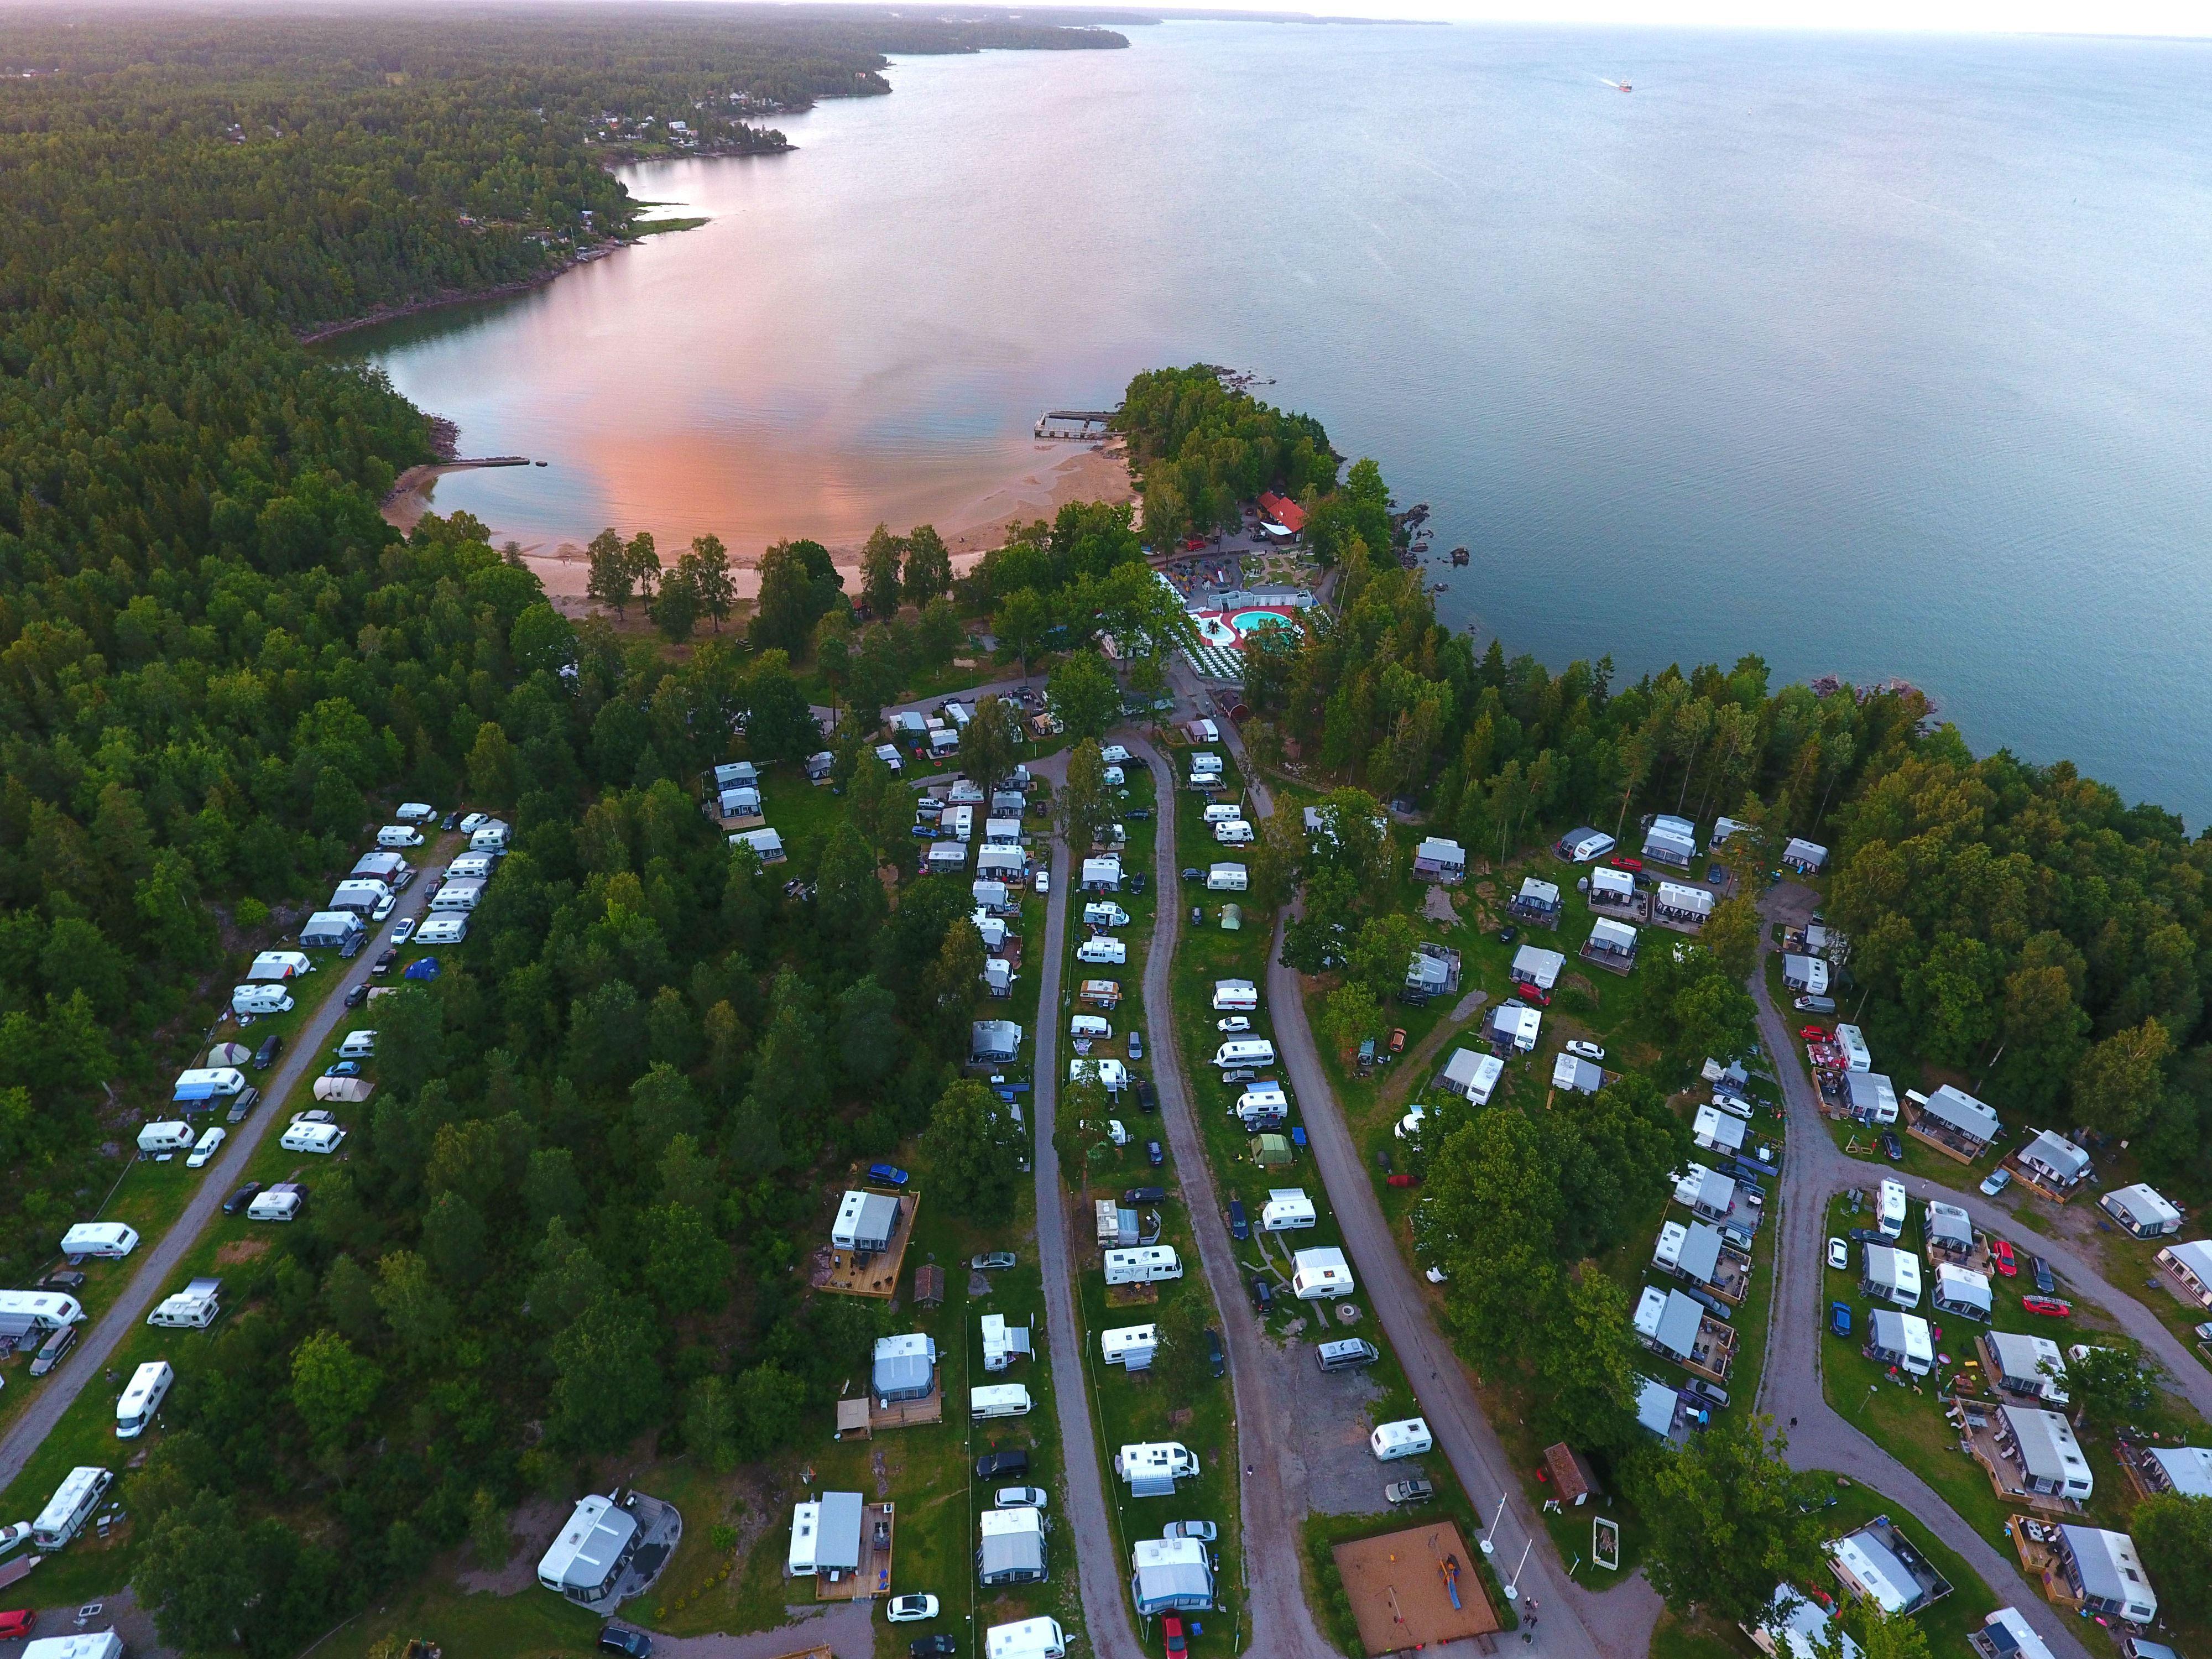 Ursands Camping